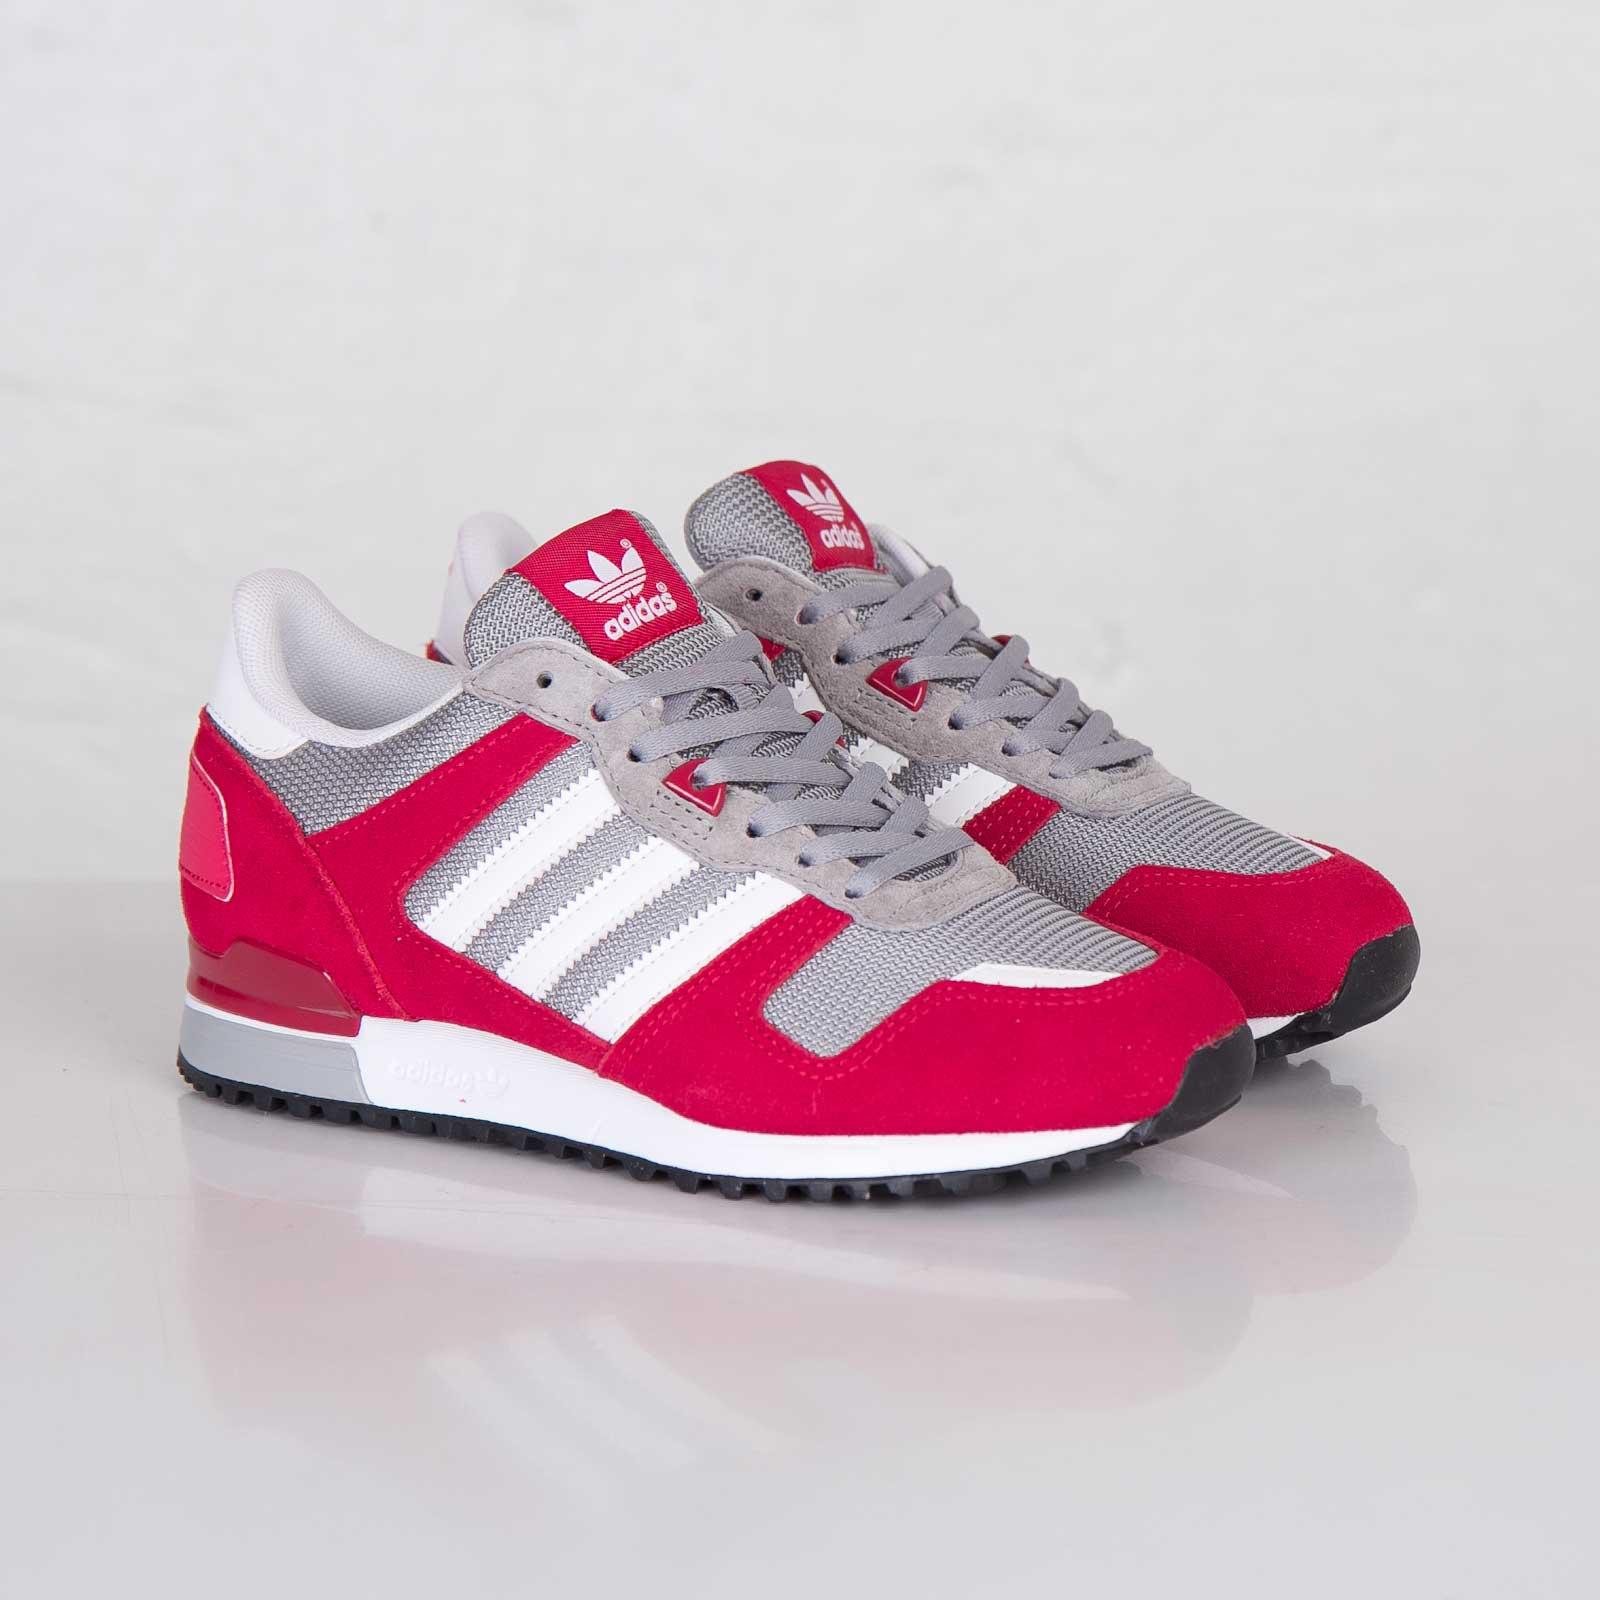 Adidas Zx 700 W D65878 Scarpe Streetwear da Ginnasticanstuff Scarpe & Streetwear Scarpe b85eb6